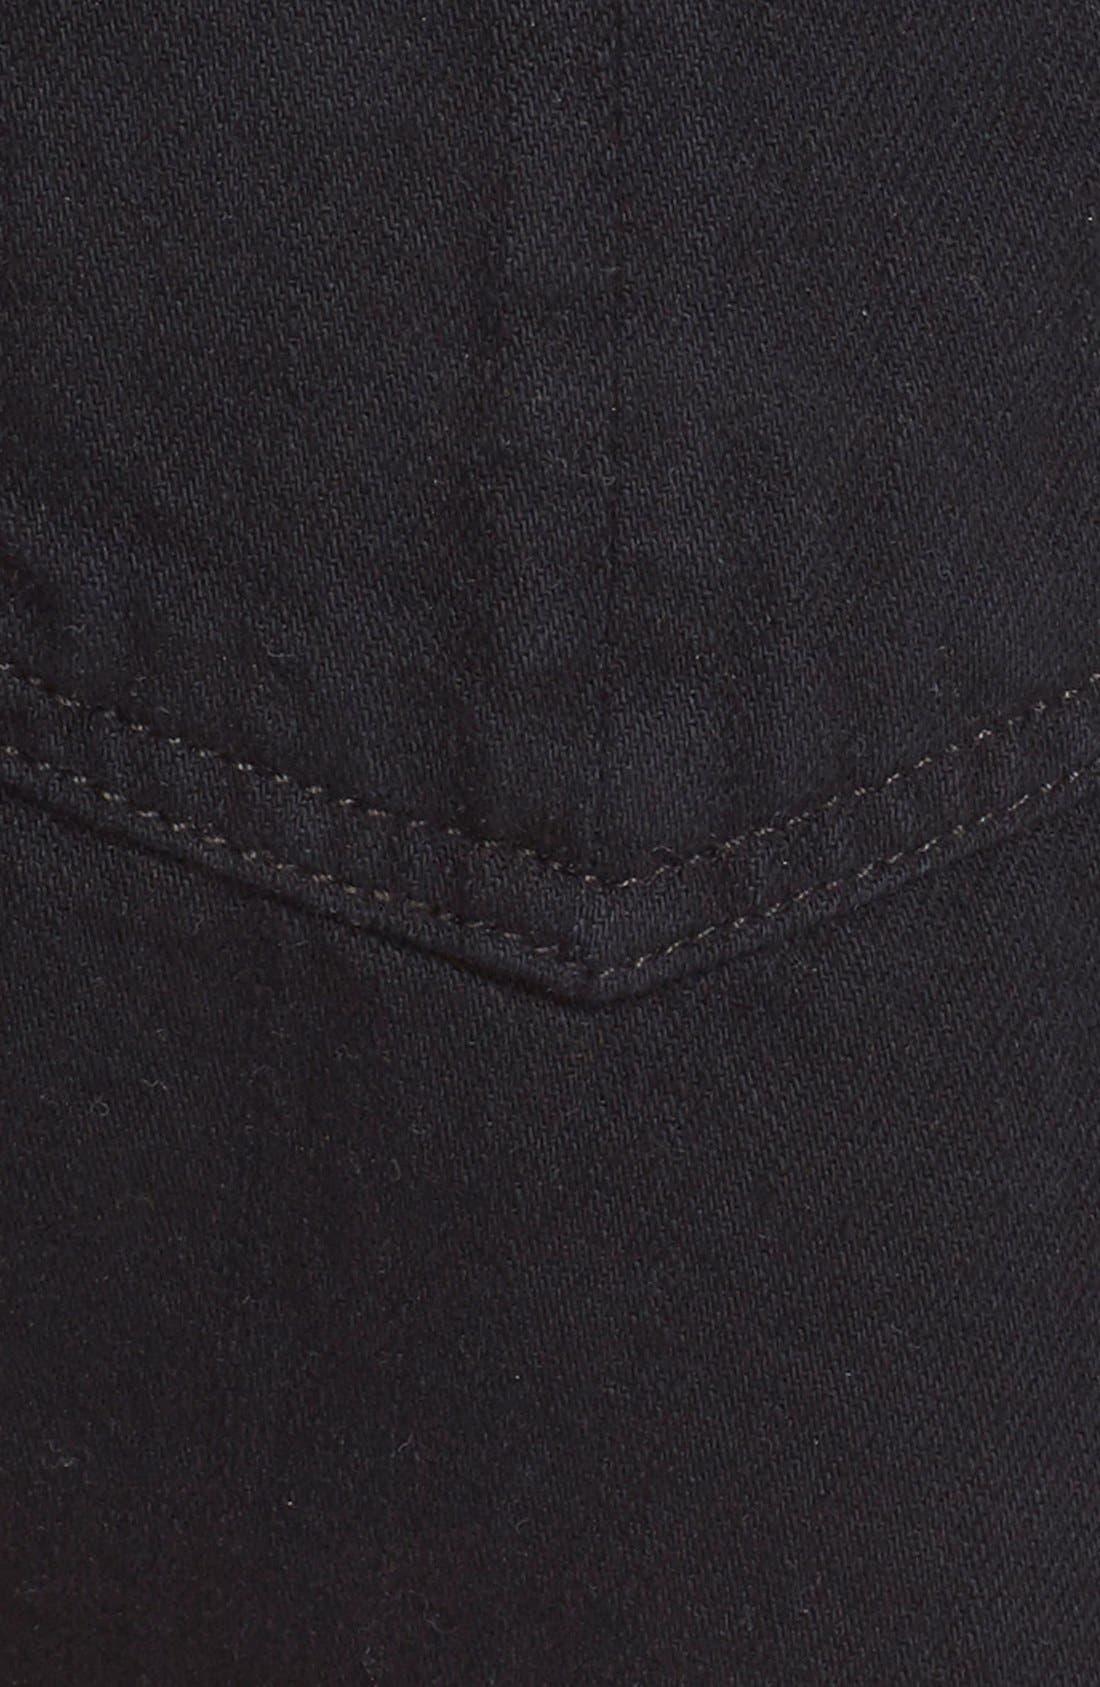 Cutoff Denim Shorts,                             Alternate thumbnail 6, color,                             001